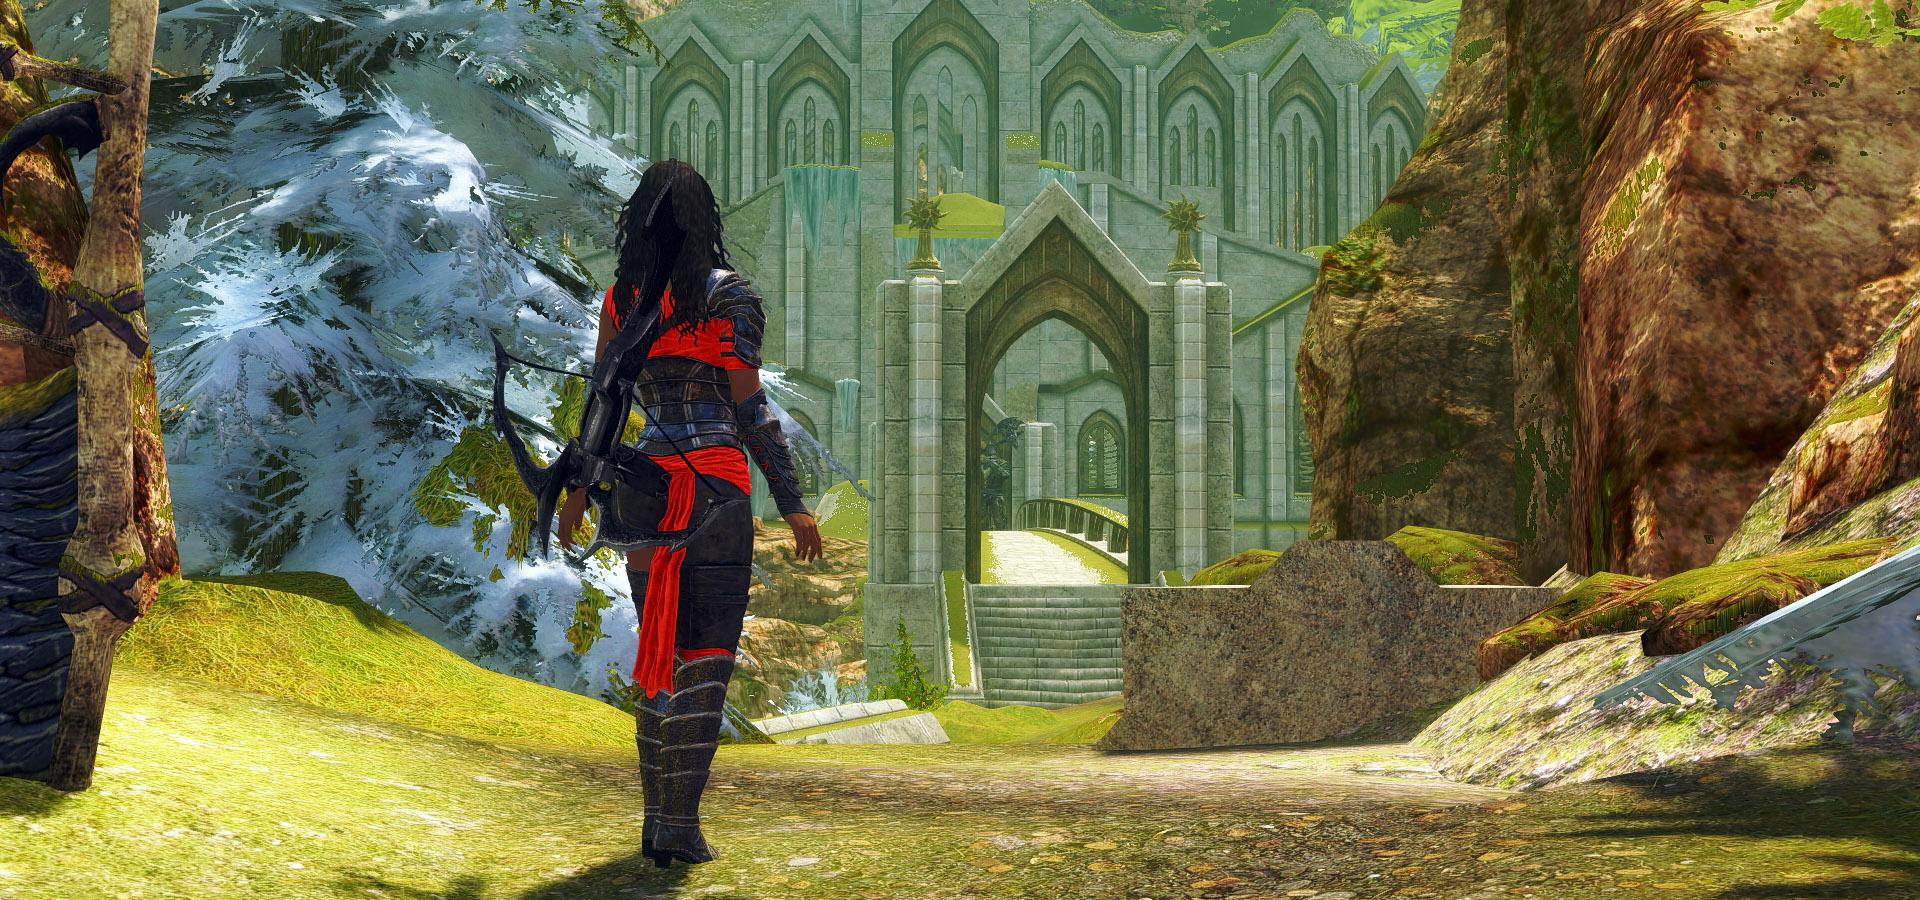 569. Святилище Ауриэля.jpg - Elder Scrolls 5: Skyrim, the CBBE, Сборка-21